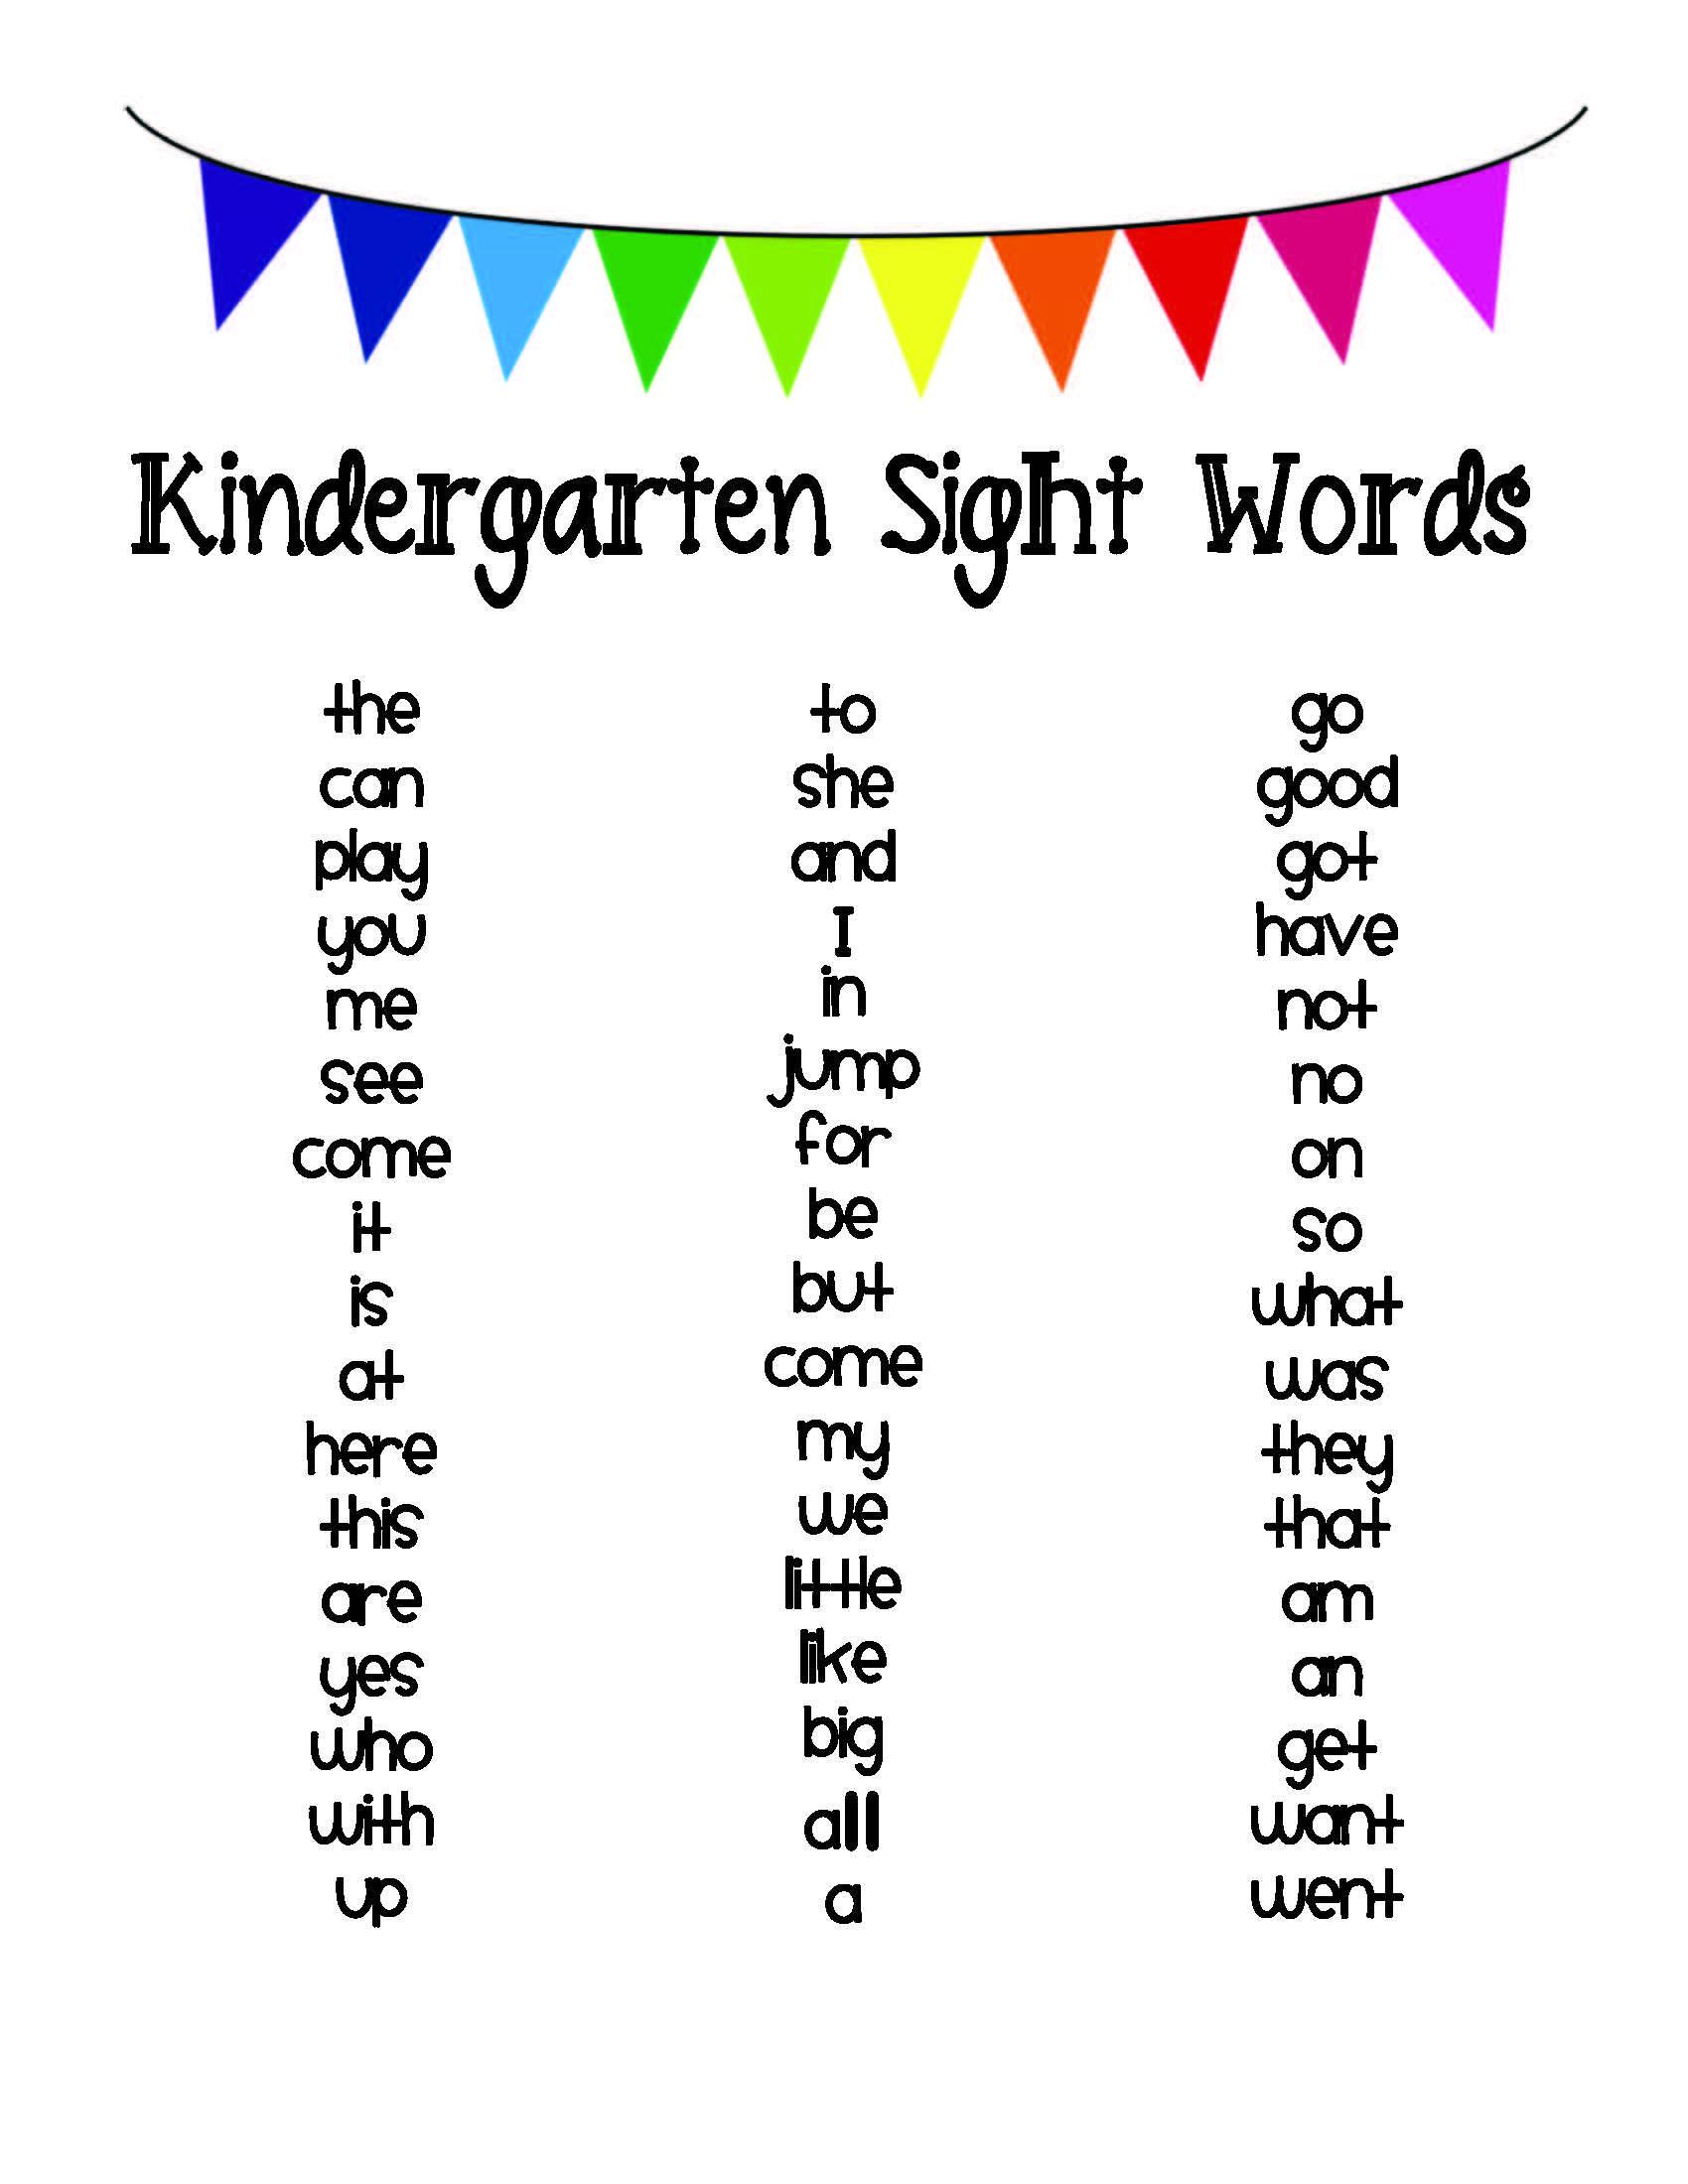 Worksheet Preschool Sight Words worksheet sight words preschool mikyu free kindergarten word list classroom pinterest